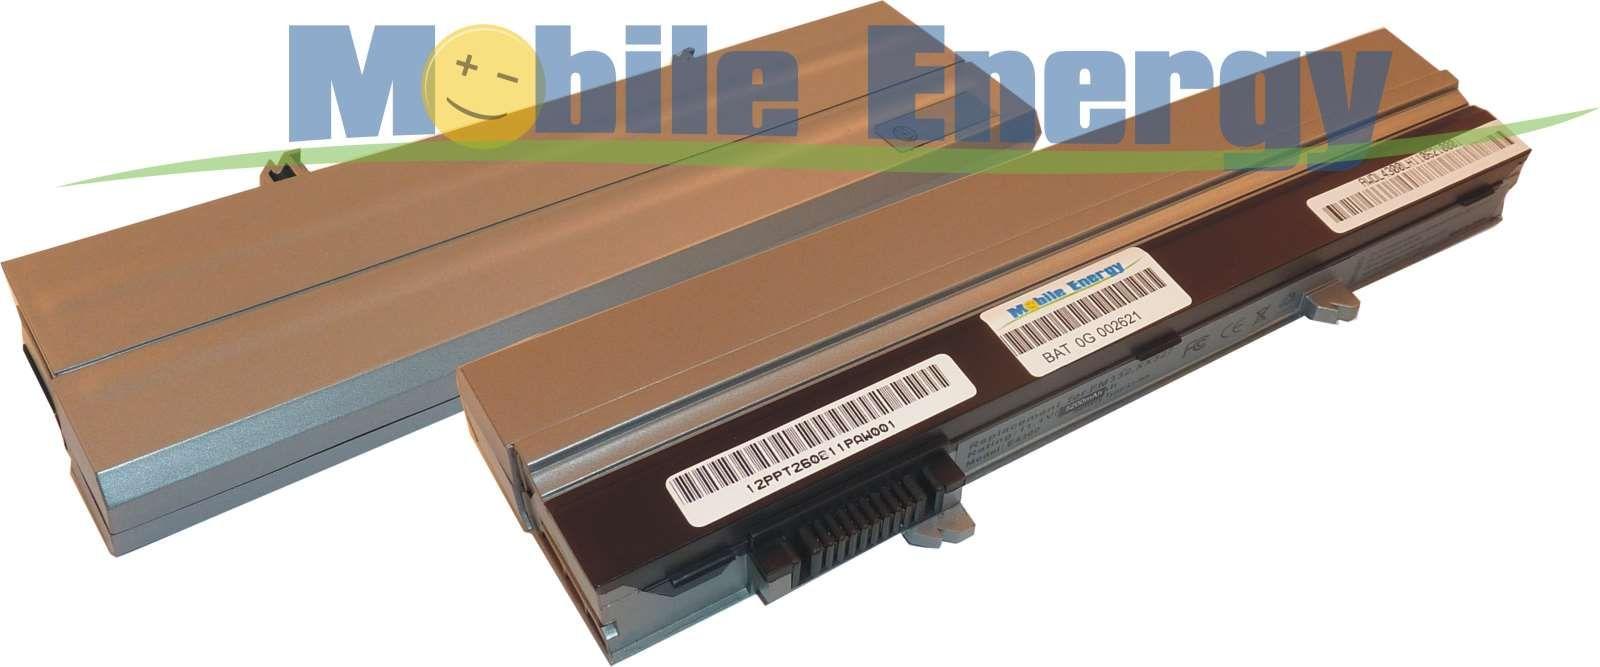 Mobile-Energy Baterie DELL Latitude E4300 / E4310 - 11.1v 5200mA